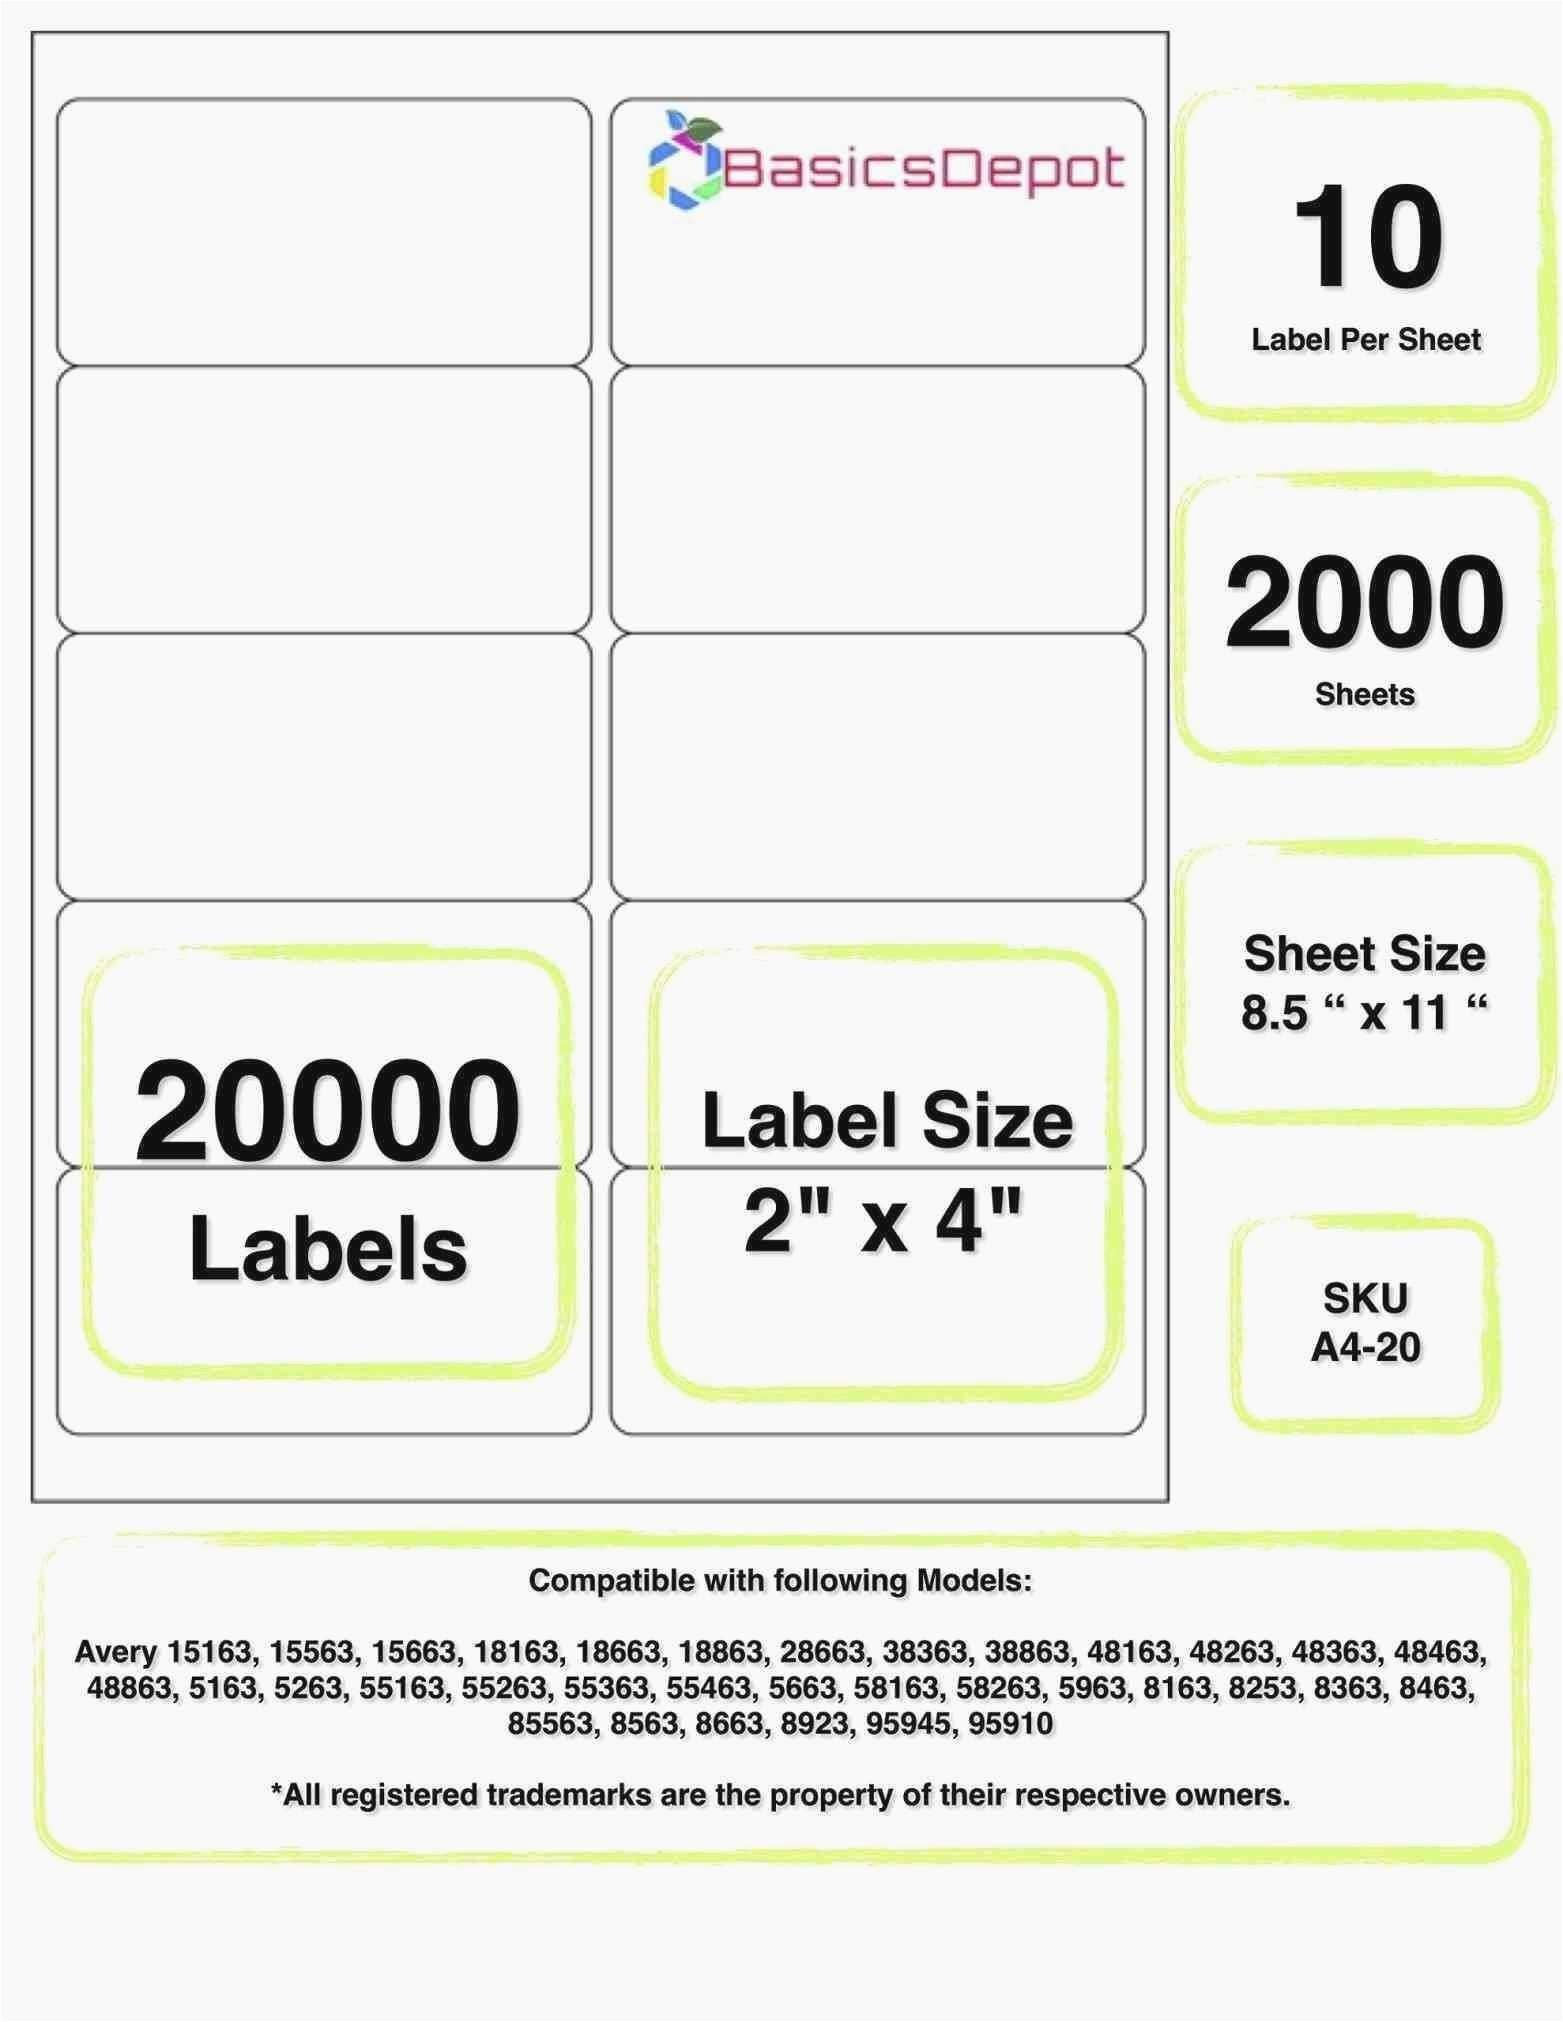 Avery 4 Up Label Template Avery 4 Up Label Template Choice Image Professional